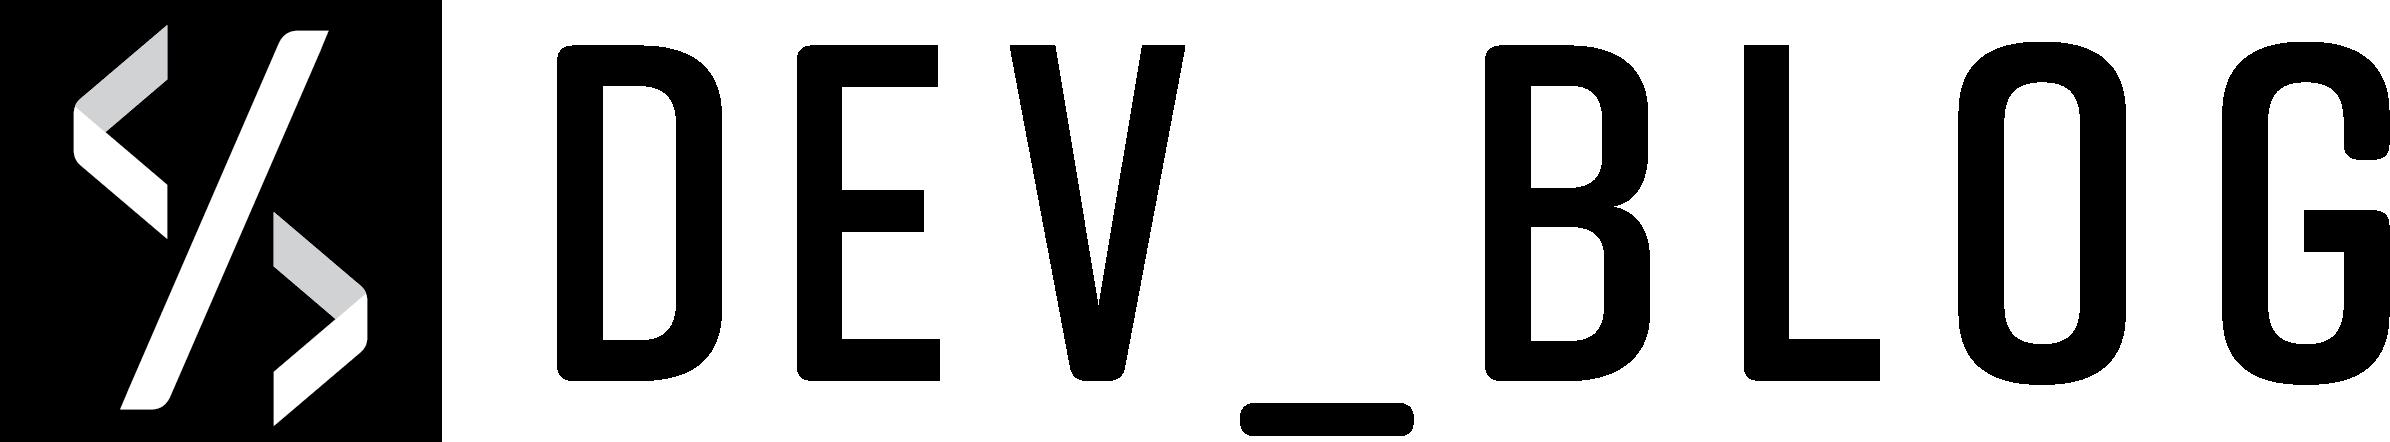 kvrdevbloghorizlogofinalblack